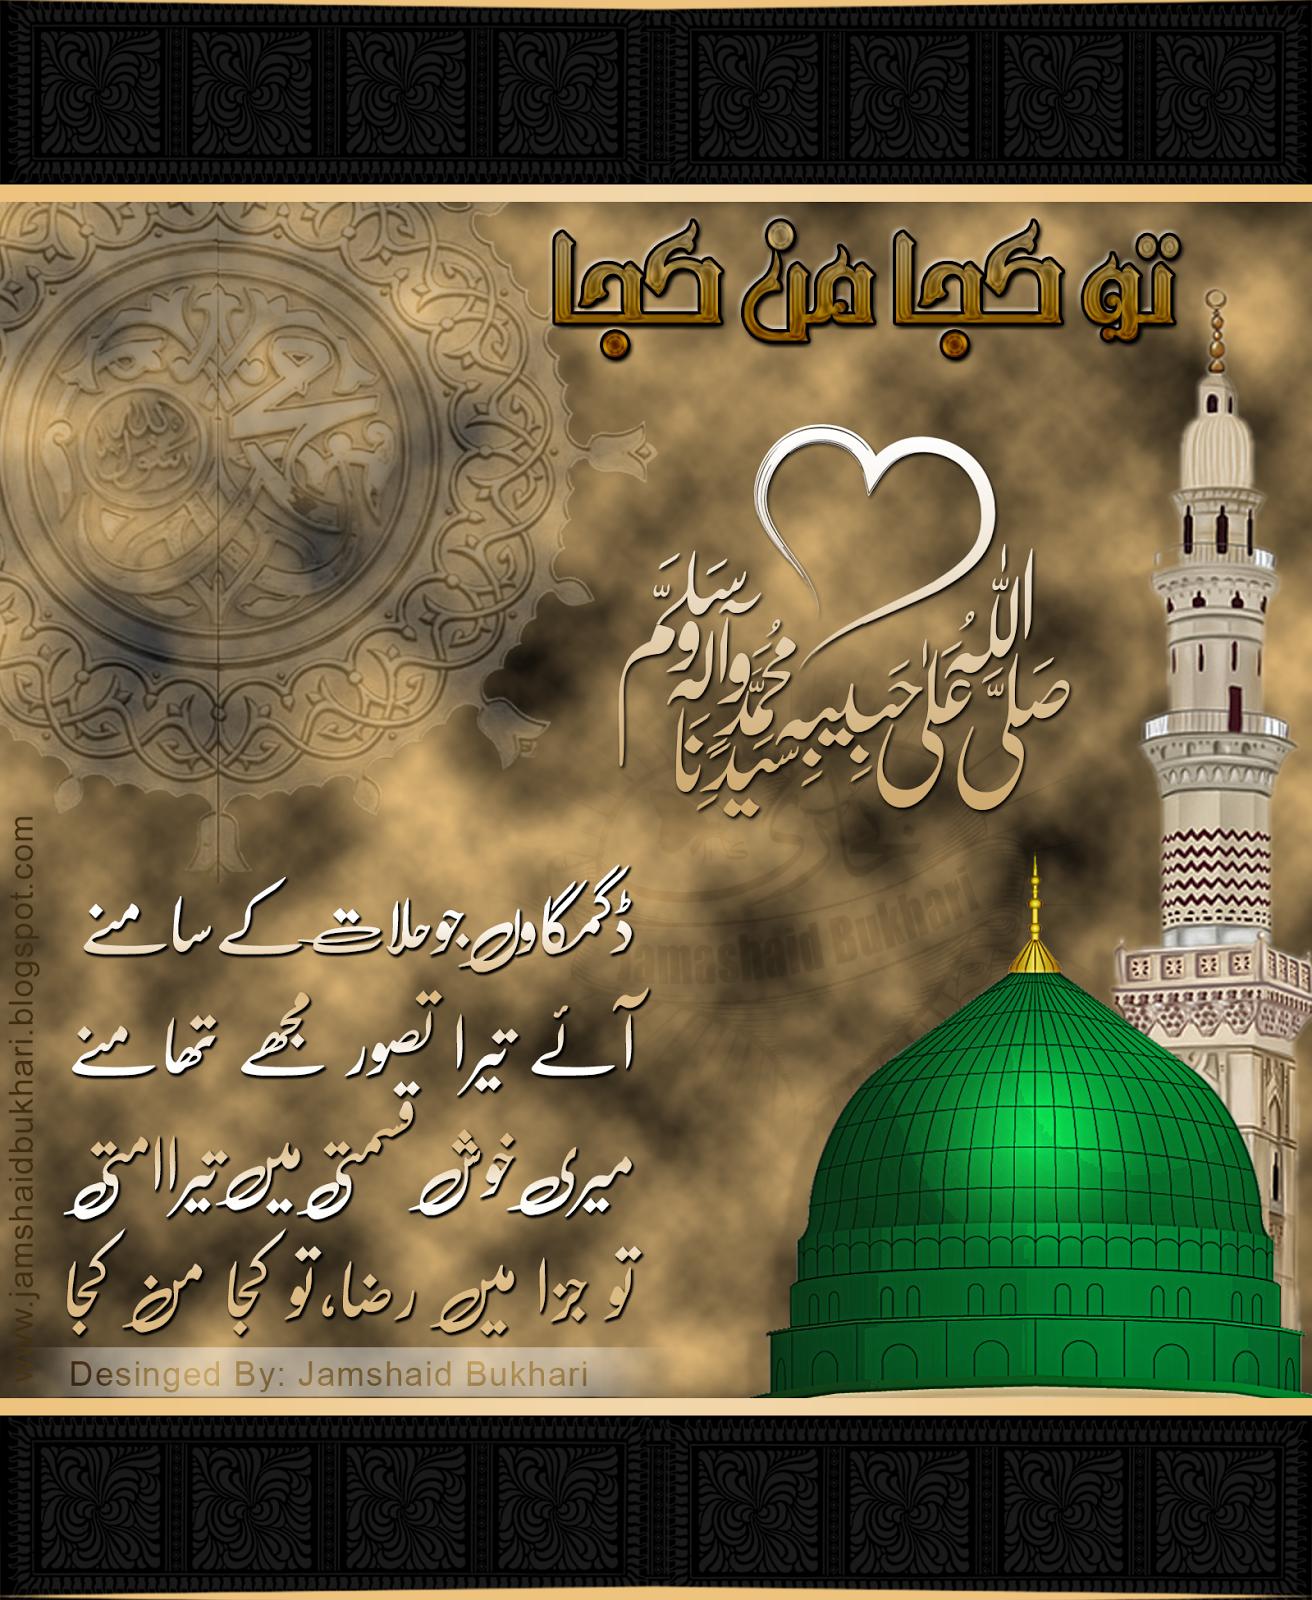 Tu Kuja Man Kuja Full Naat Lyrics Owais Raza Qadri | Naat